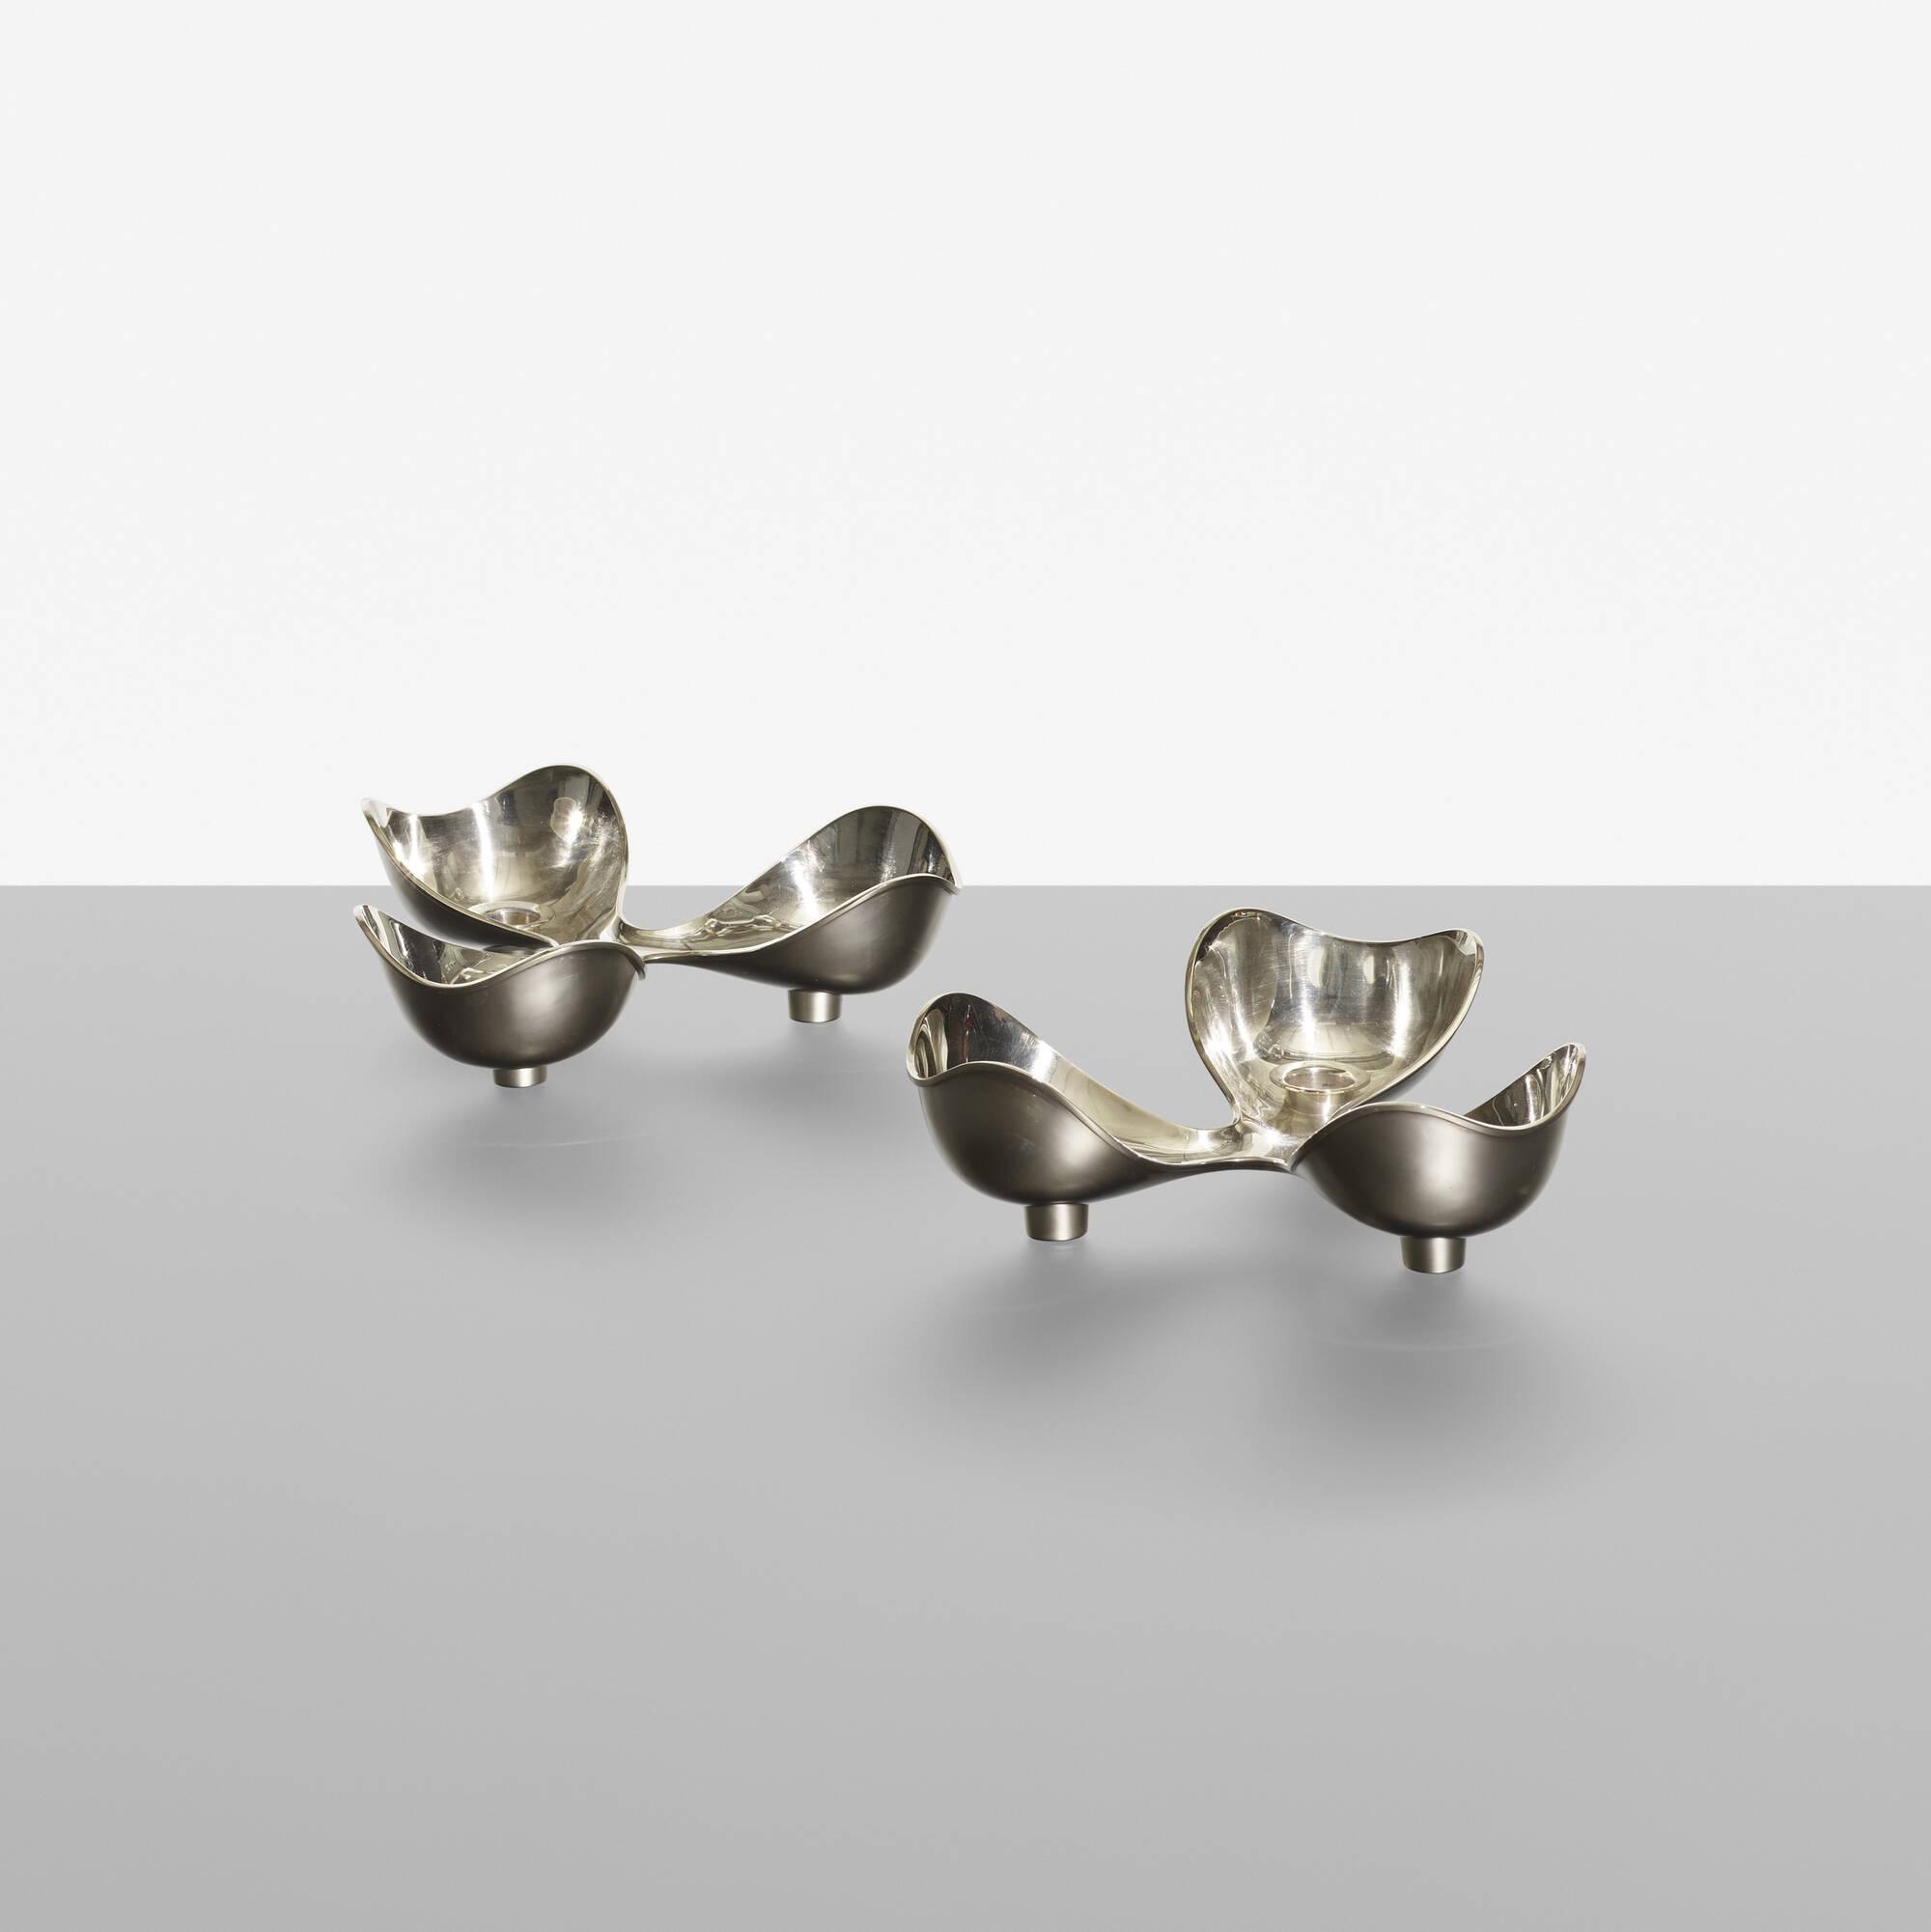 165: Ole Hagen / candleholders, pair (1 of 3)